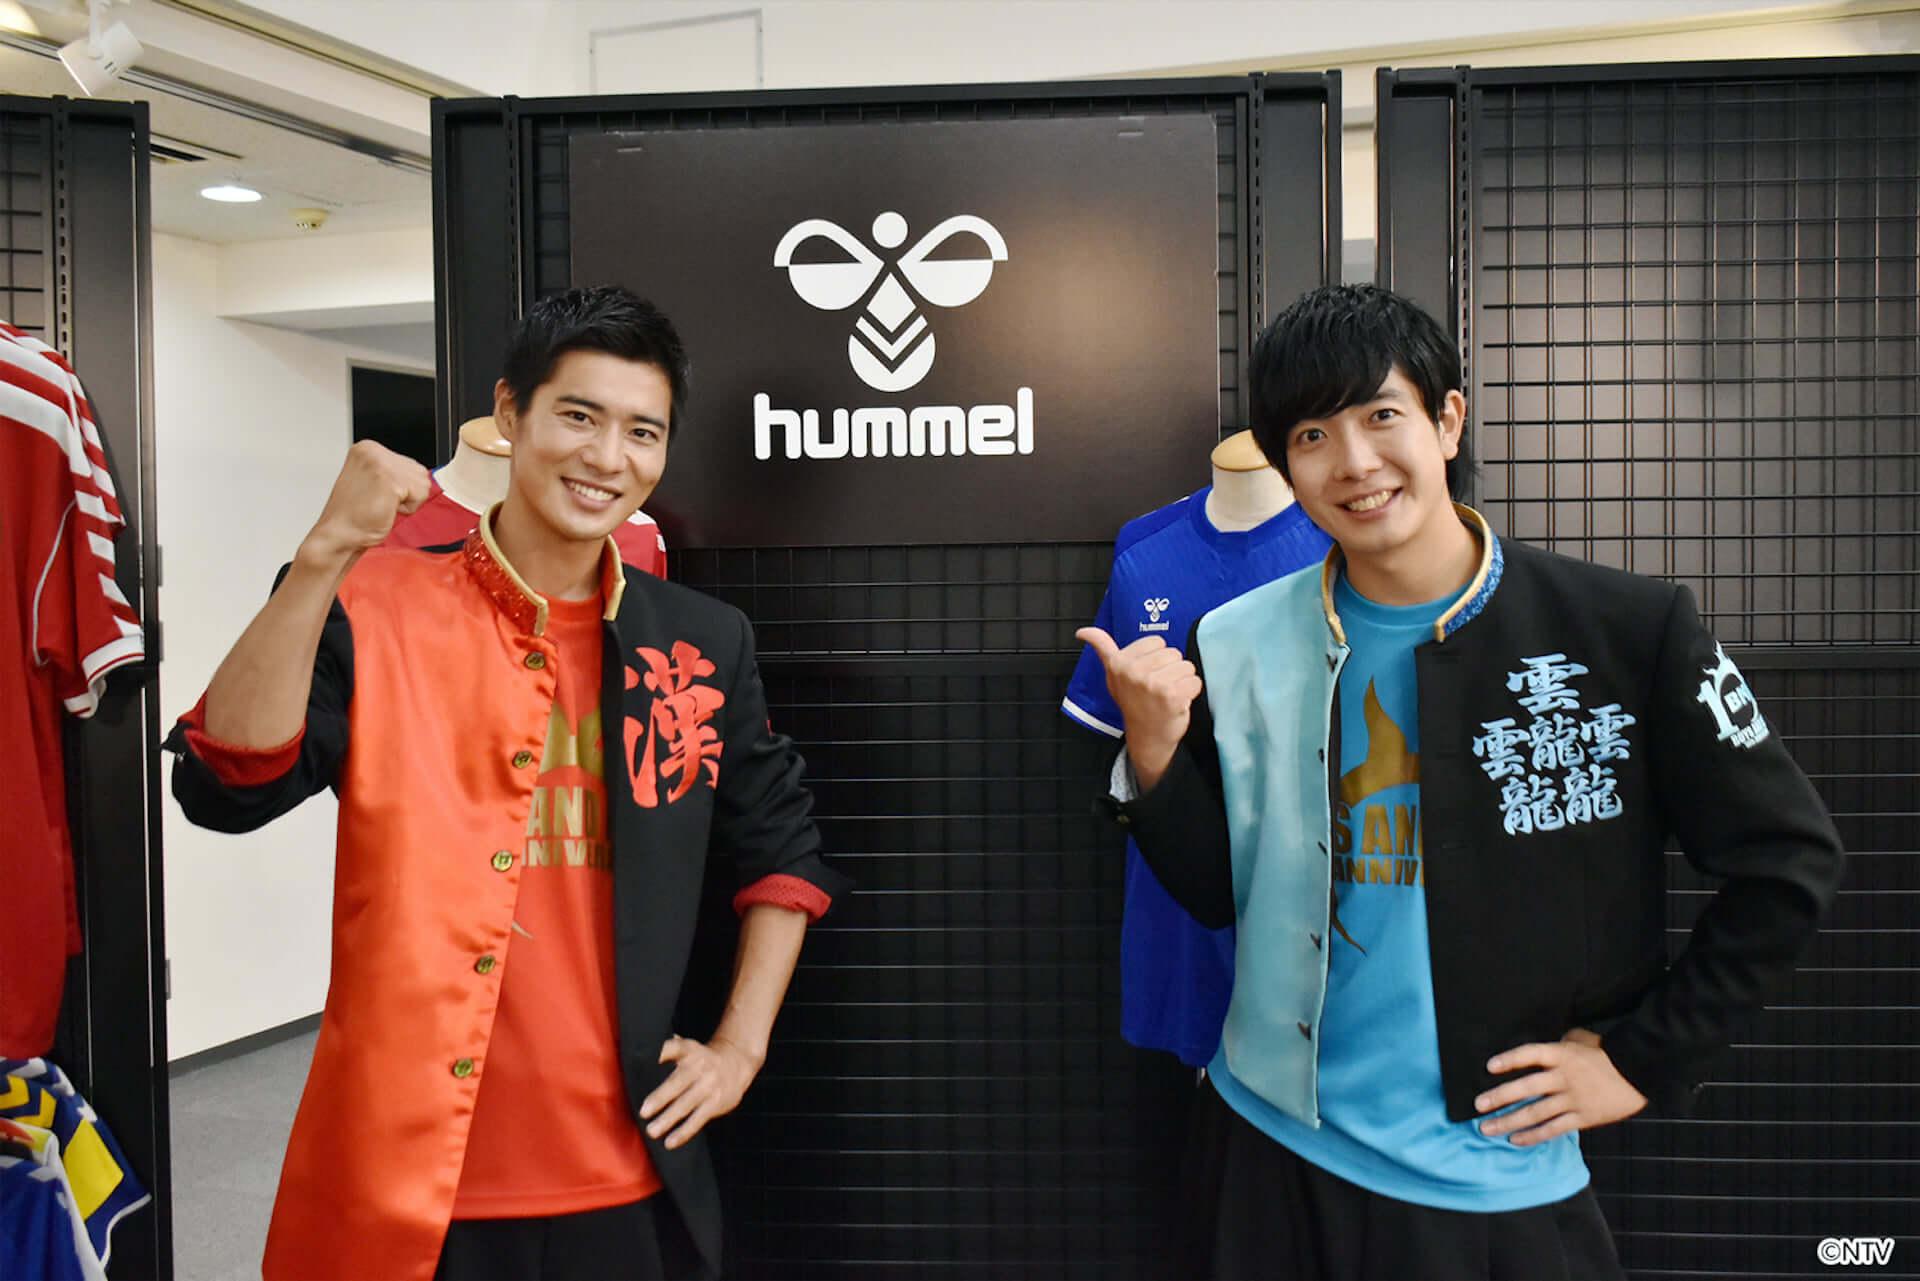 BOYS AND MEN結成10周年記念!辻本達規、田村侑久、ヒュンメルによるコラボTシャツ&ジャージが発売 lf201228_hummel_3-1920x1281